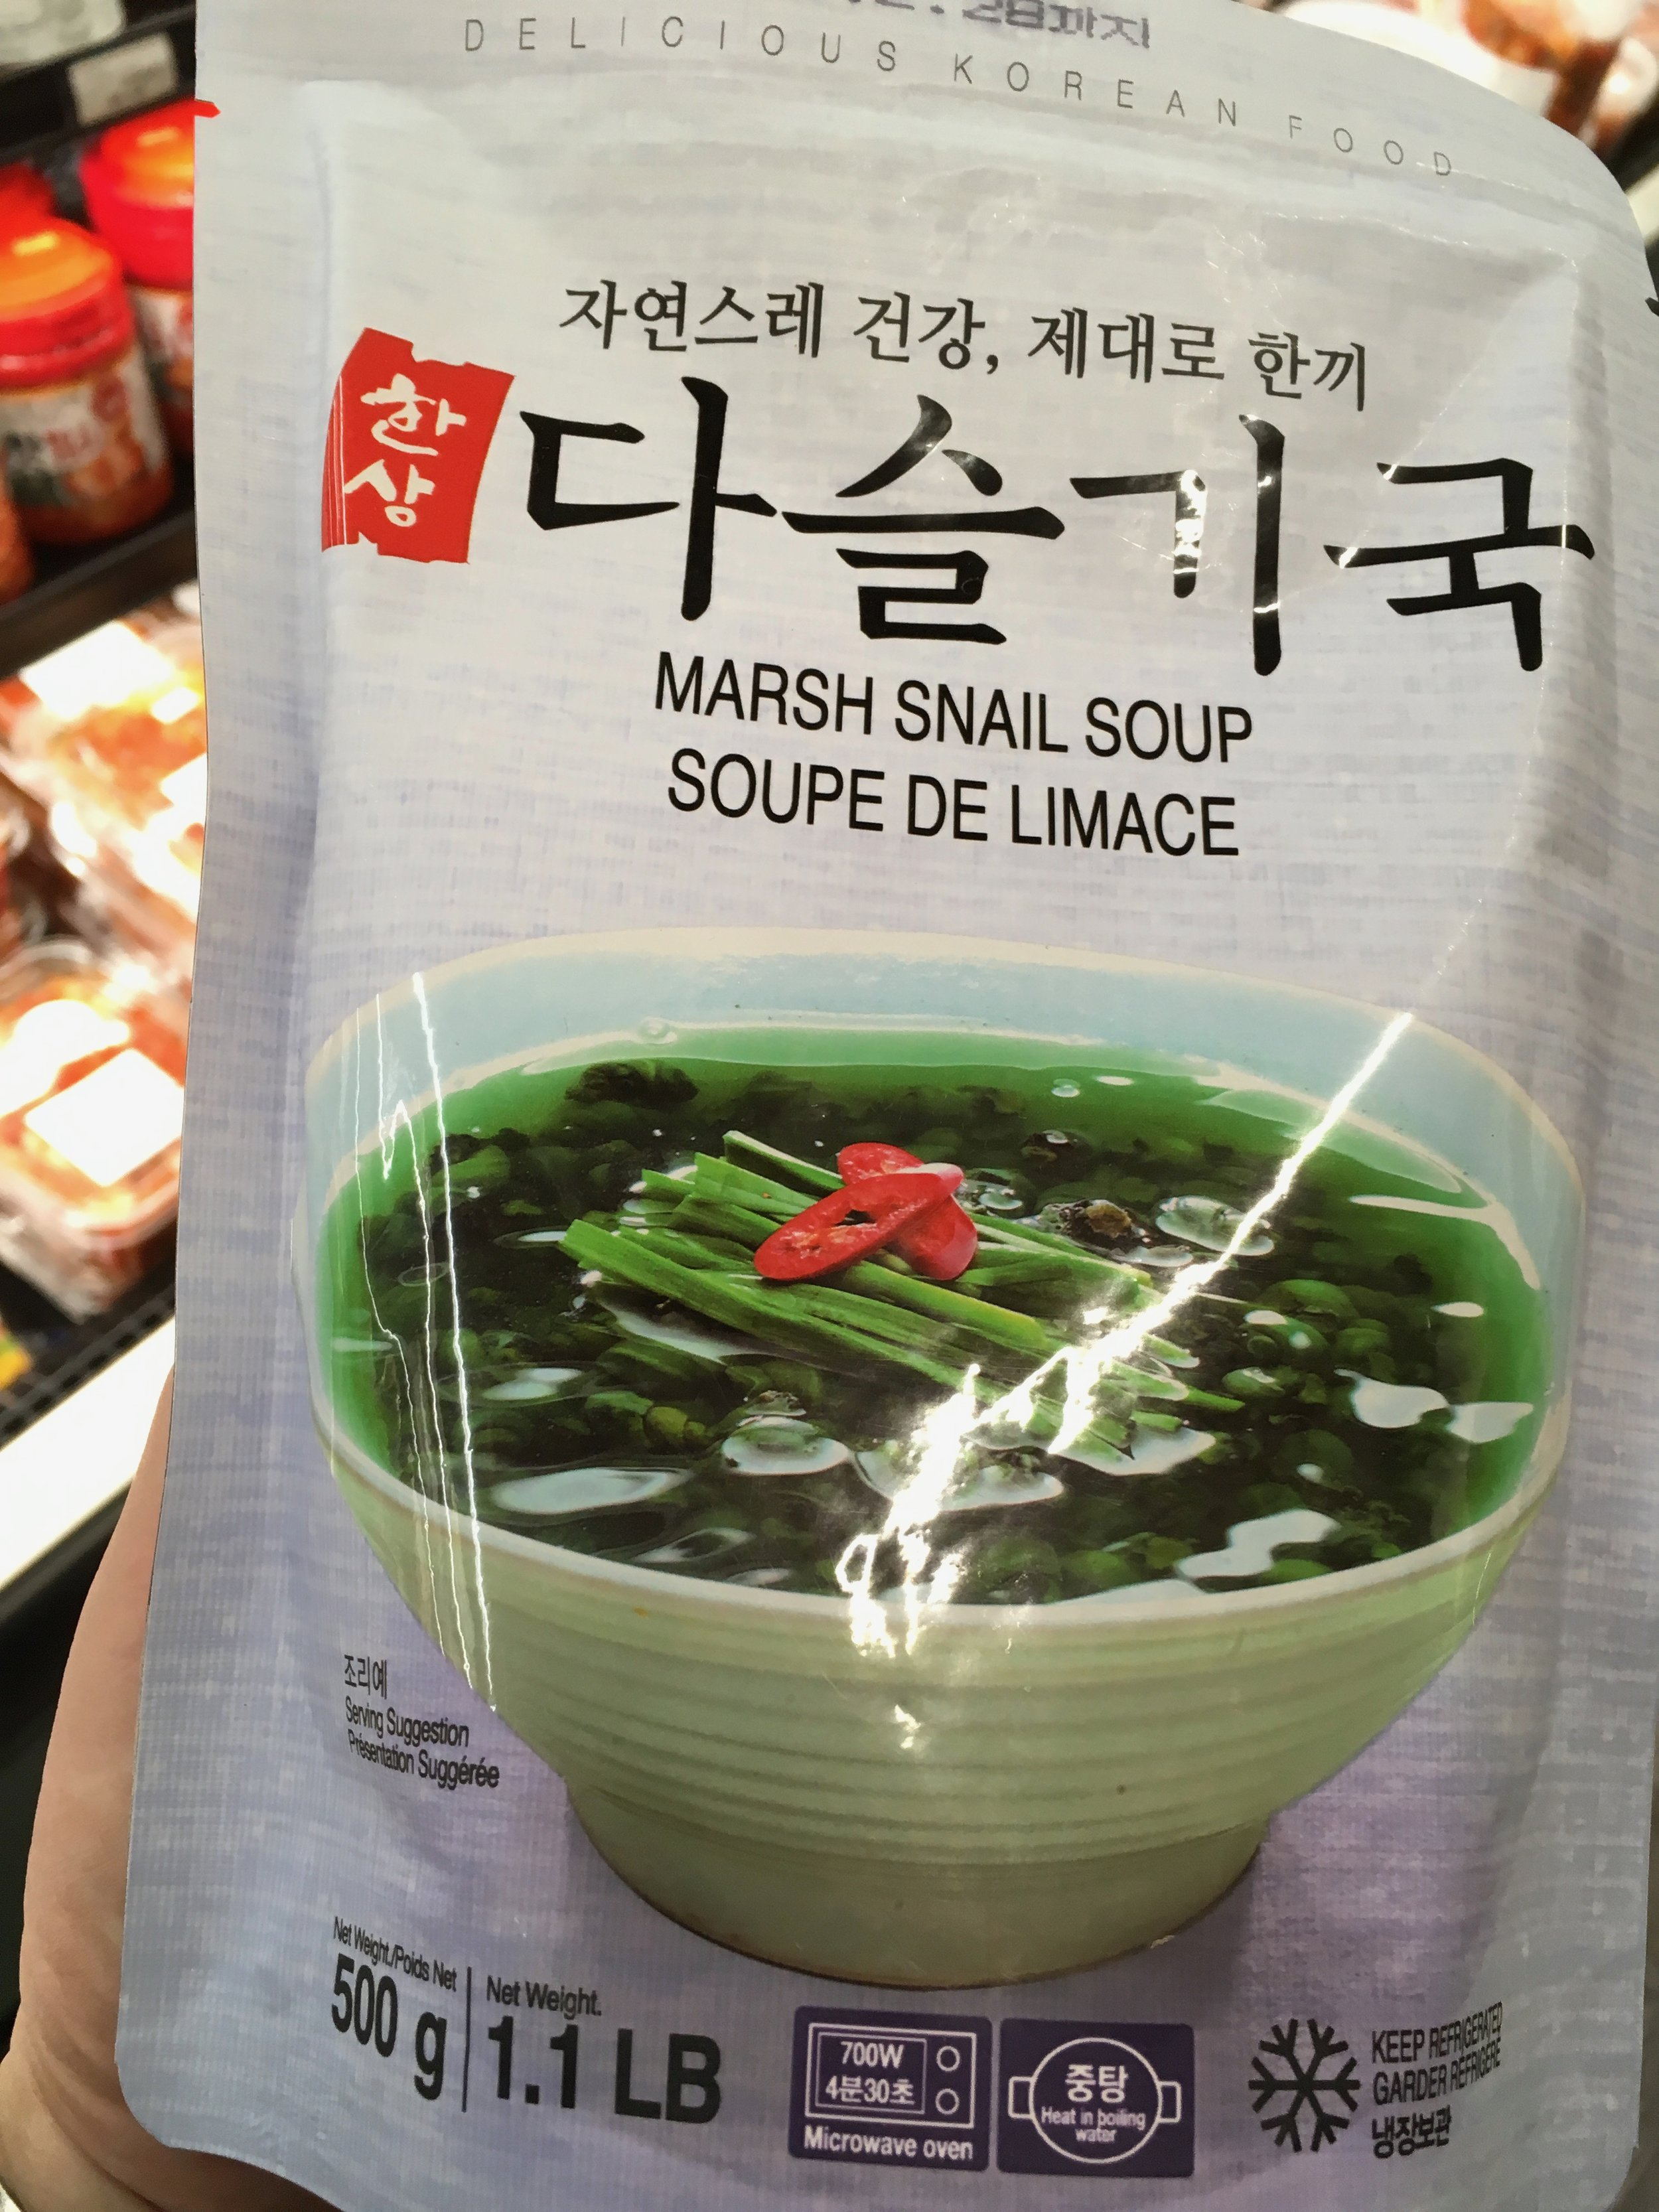 Marsh Snail Soup